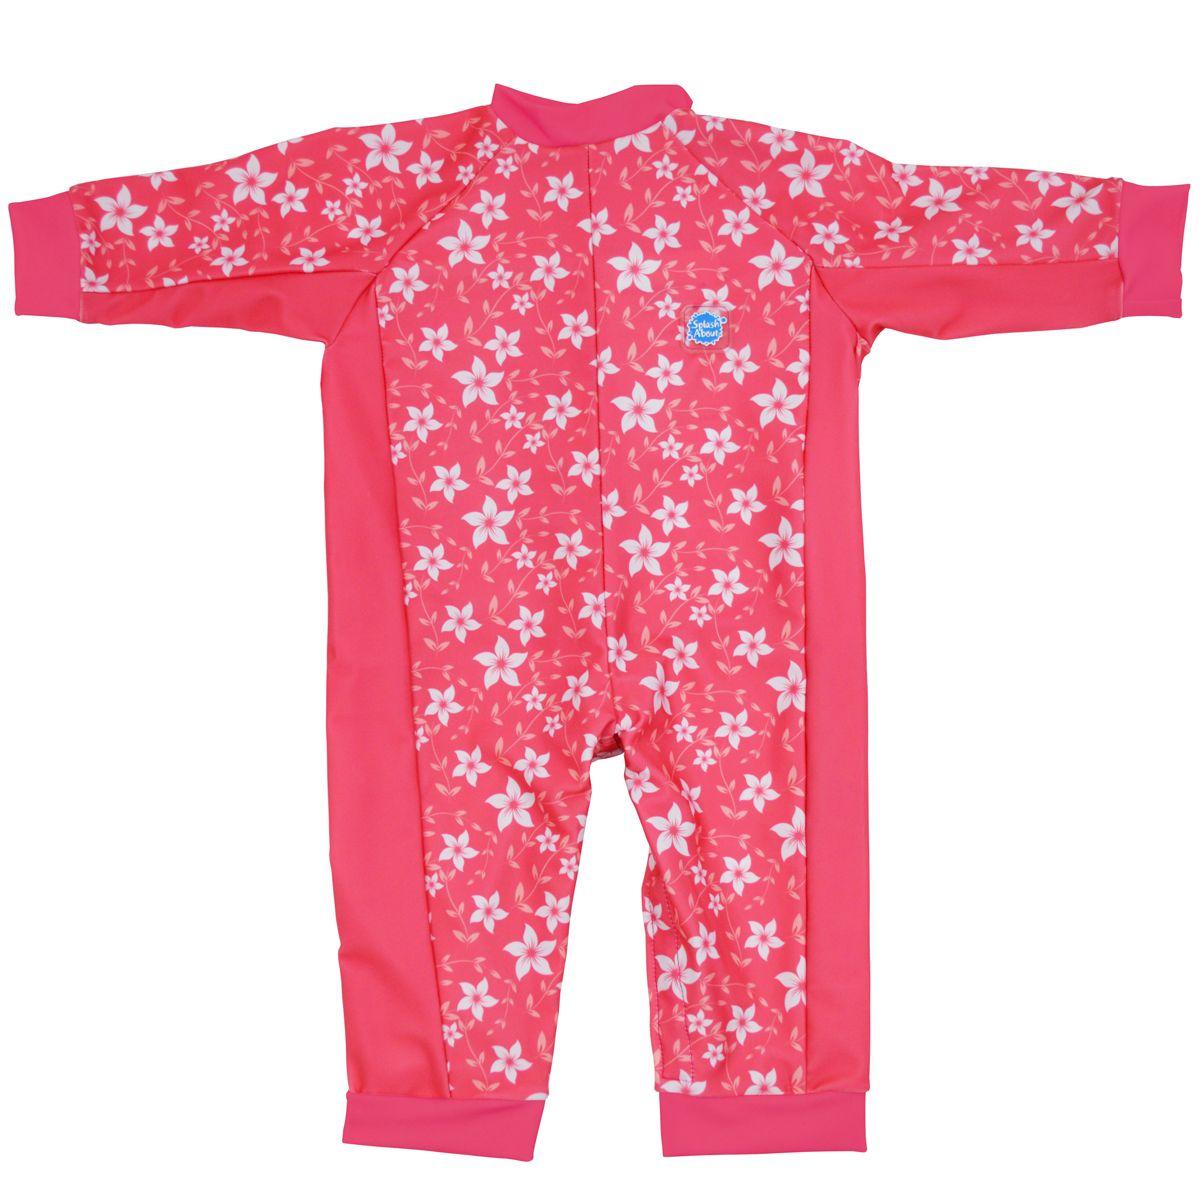 25e2888c5d6b3 Girls Pink Blossom Eczema/Beach Swimsuit for Babies (UV/Sun Protection)